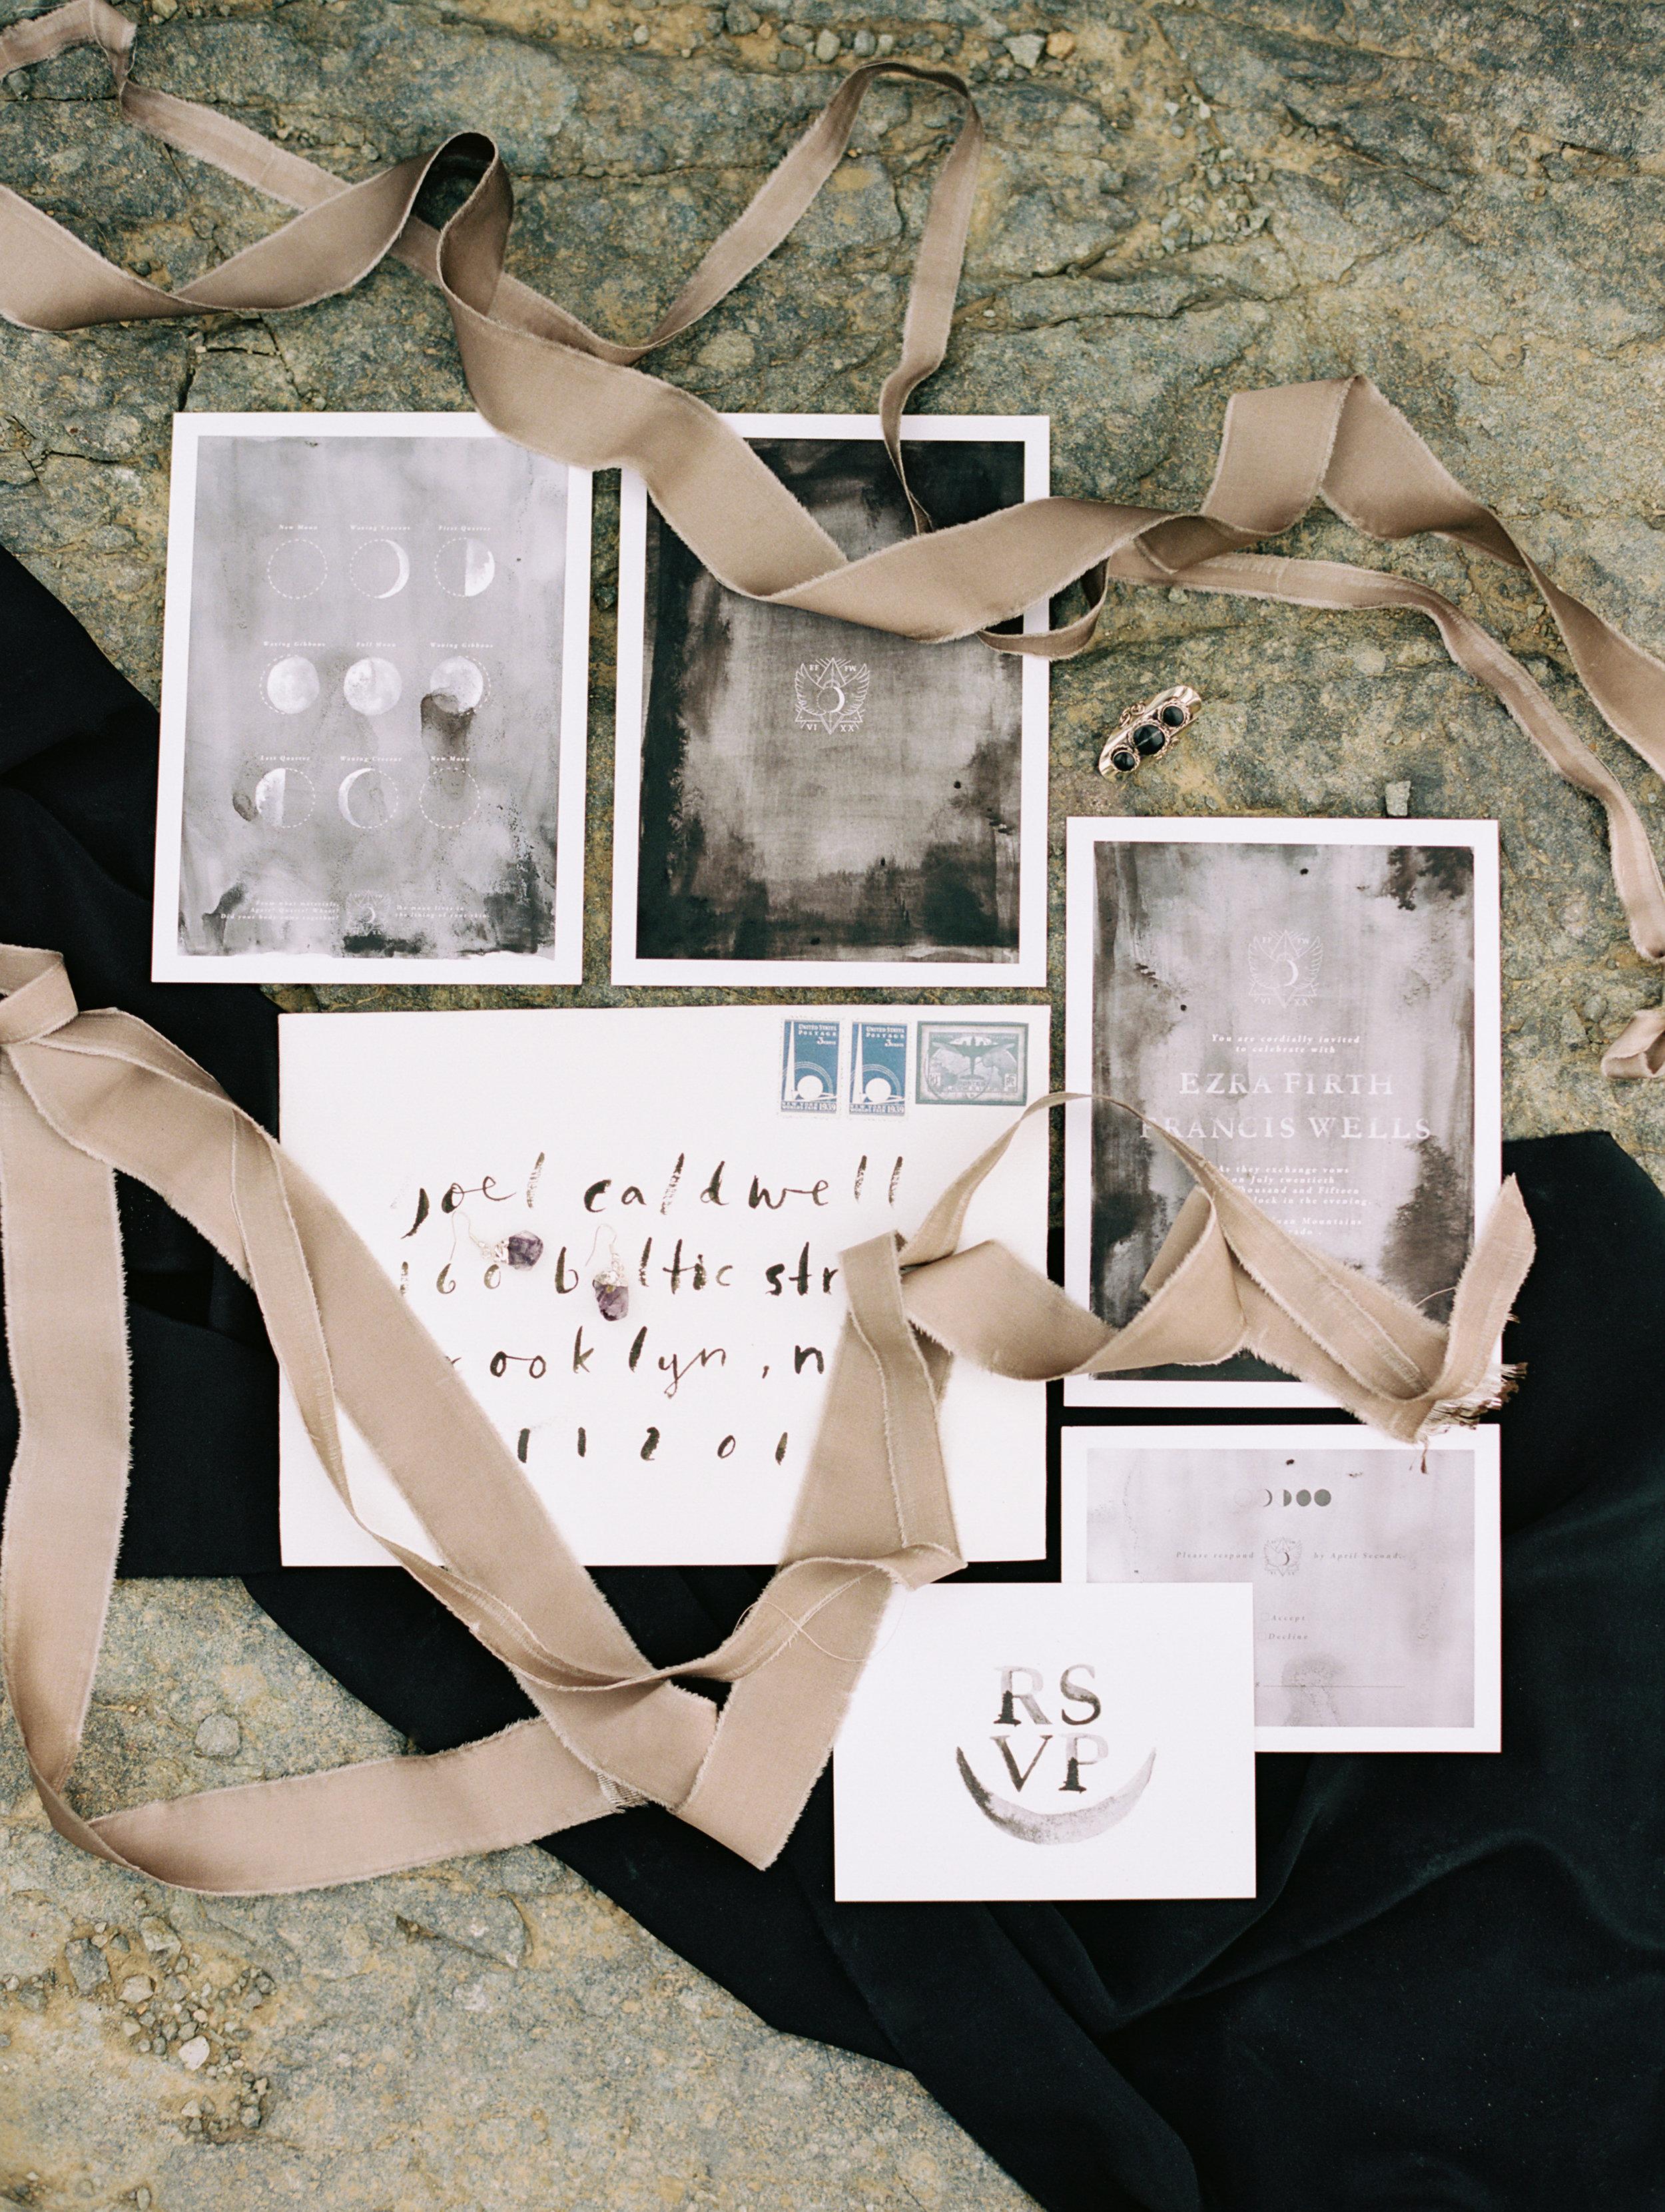 196_Brumley _ Wells_Workshop_Fine_Art_Film_Photography_colorado_.jpg